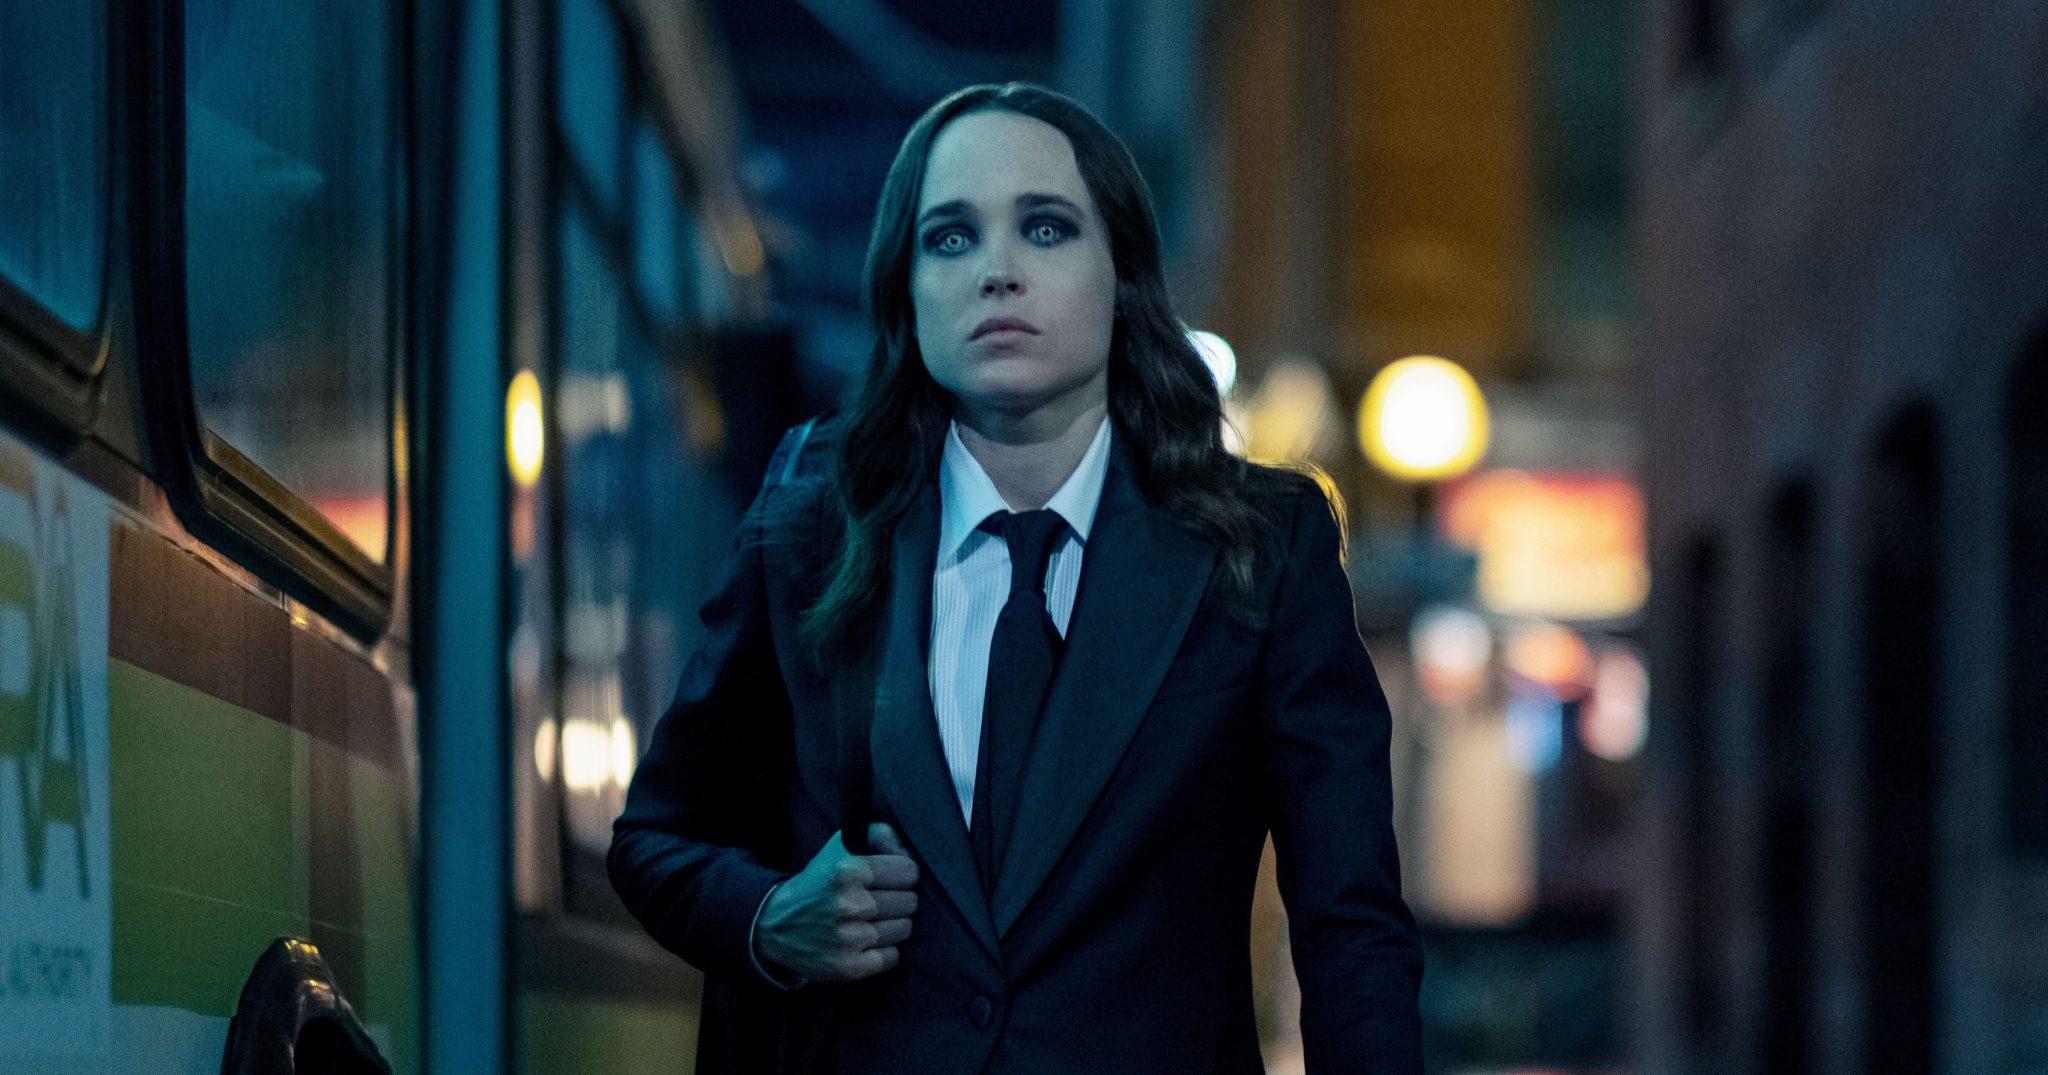 Netflix's Umbrella Academy has been picking up steam since its shocking Season 1 finale.